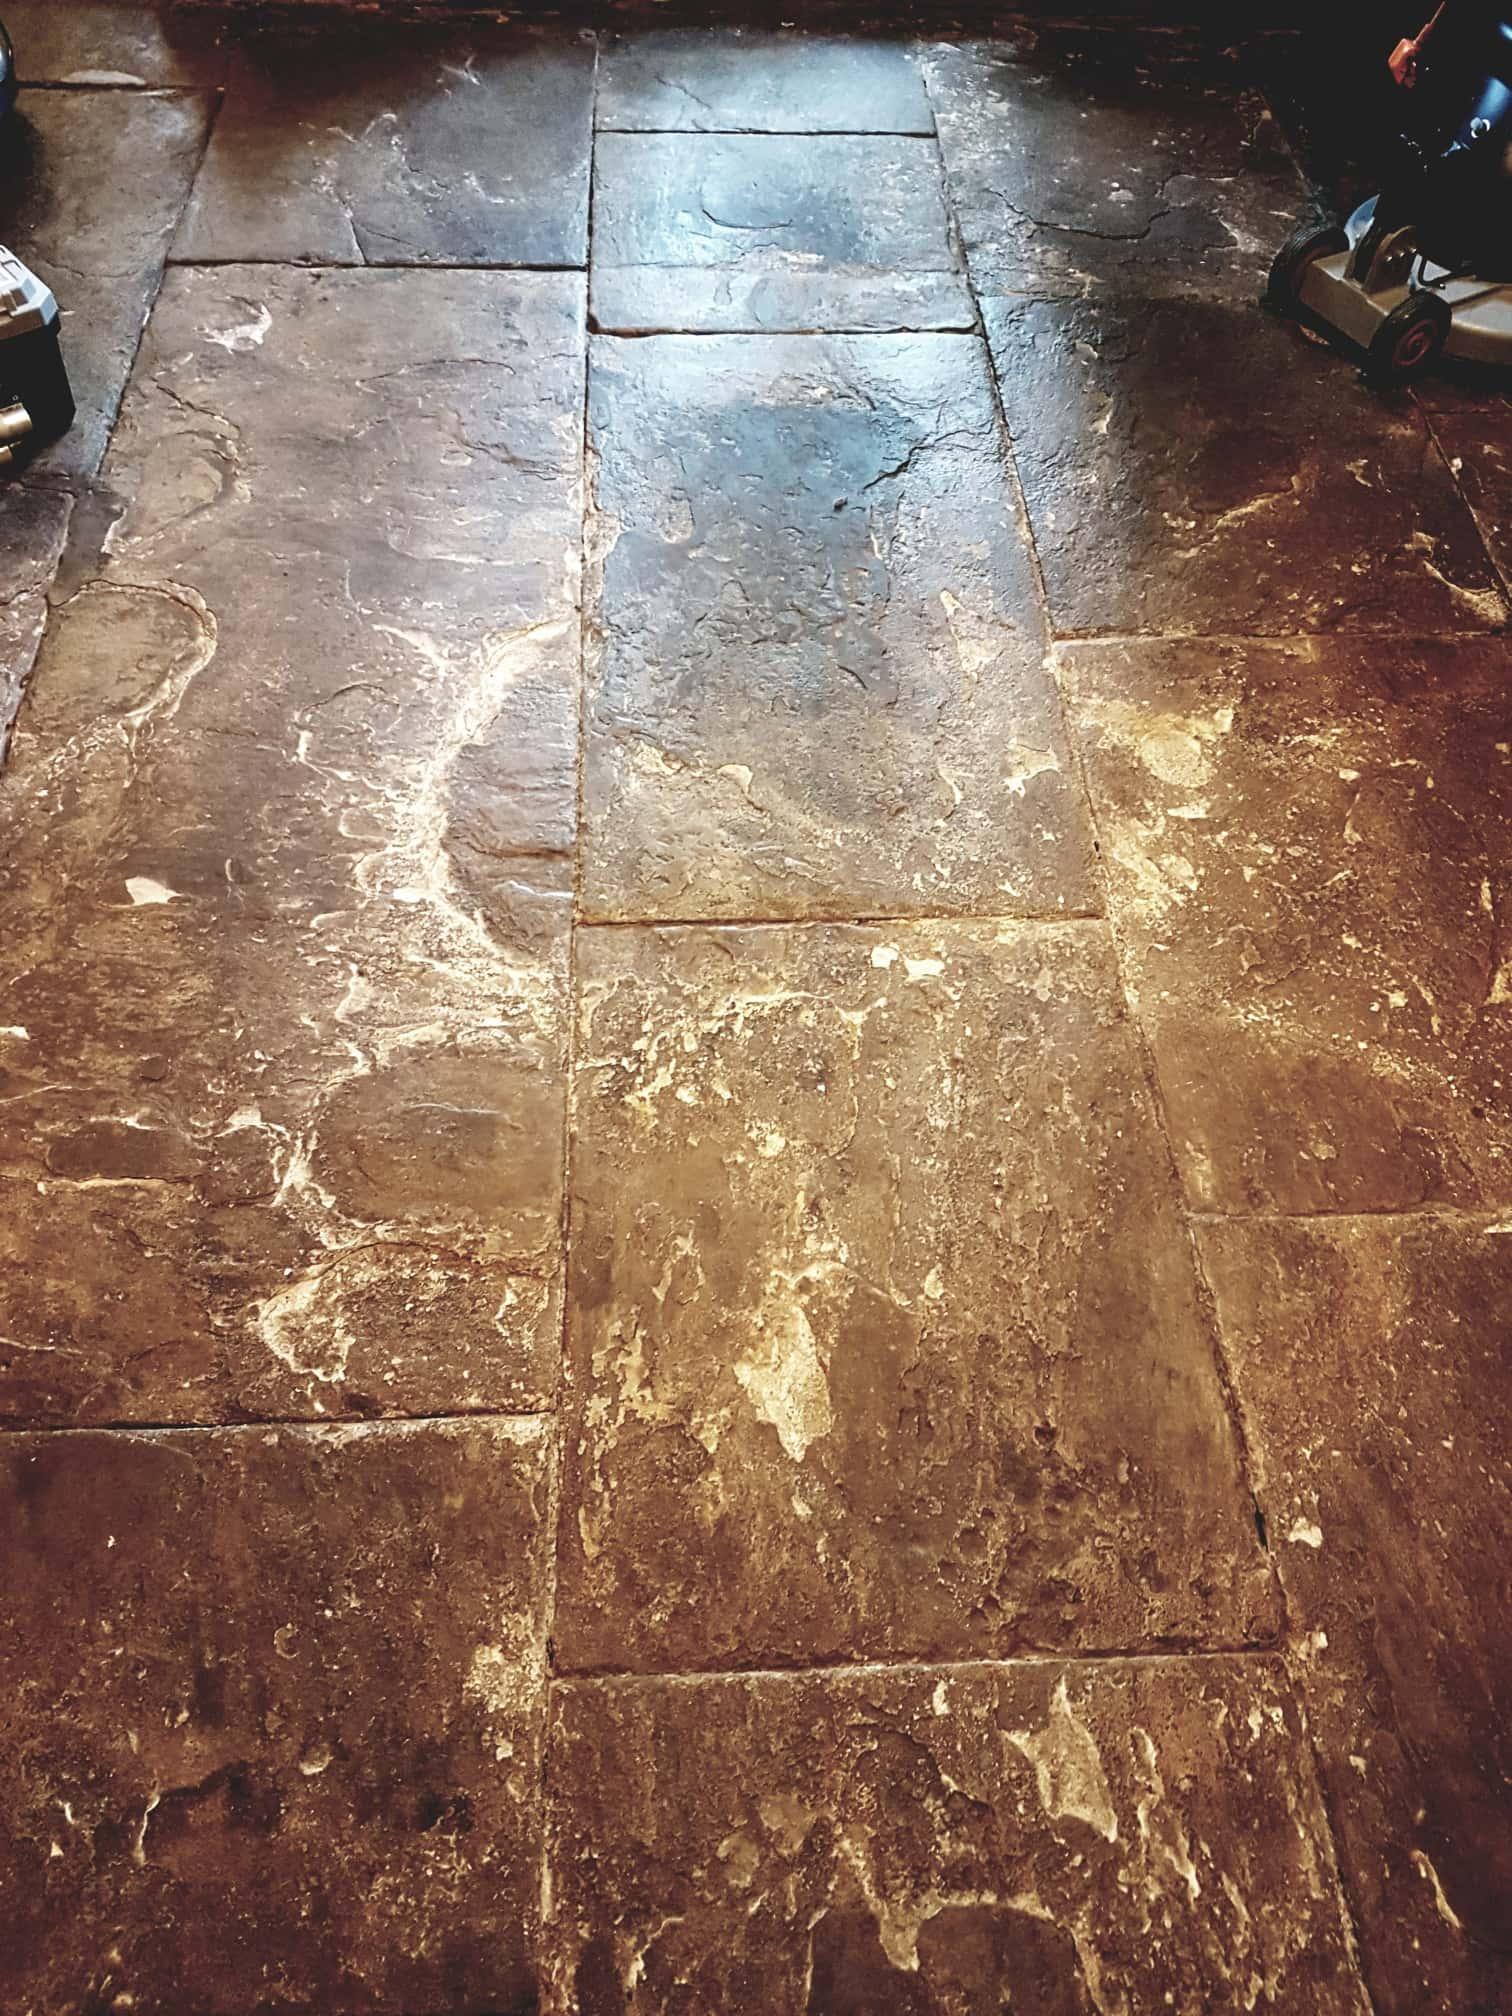 Flagstone Floor Before Grouting Cleaning Leeds